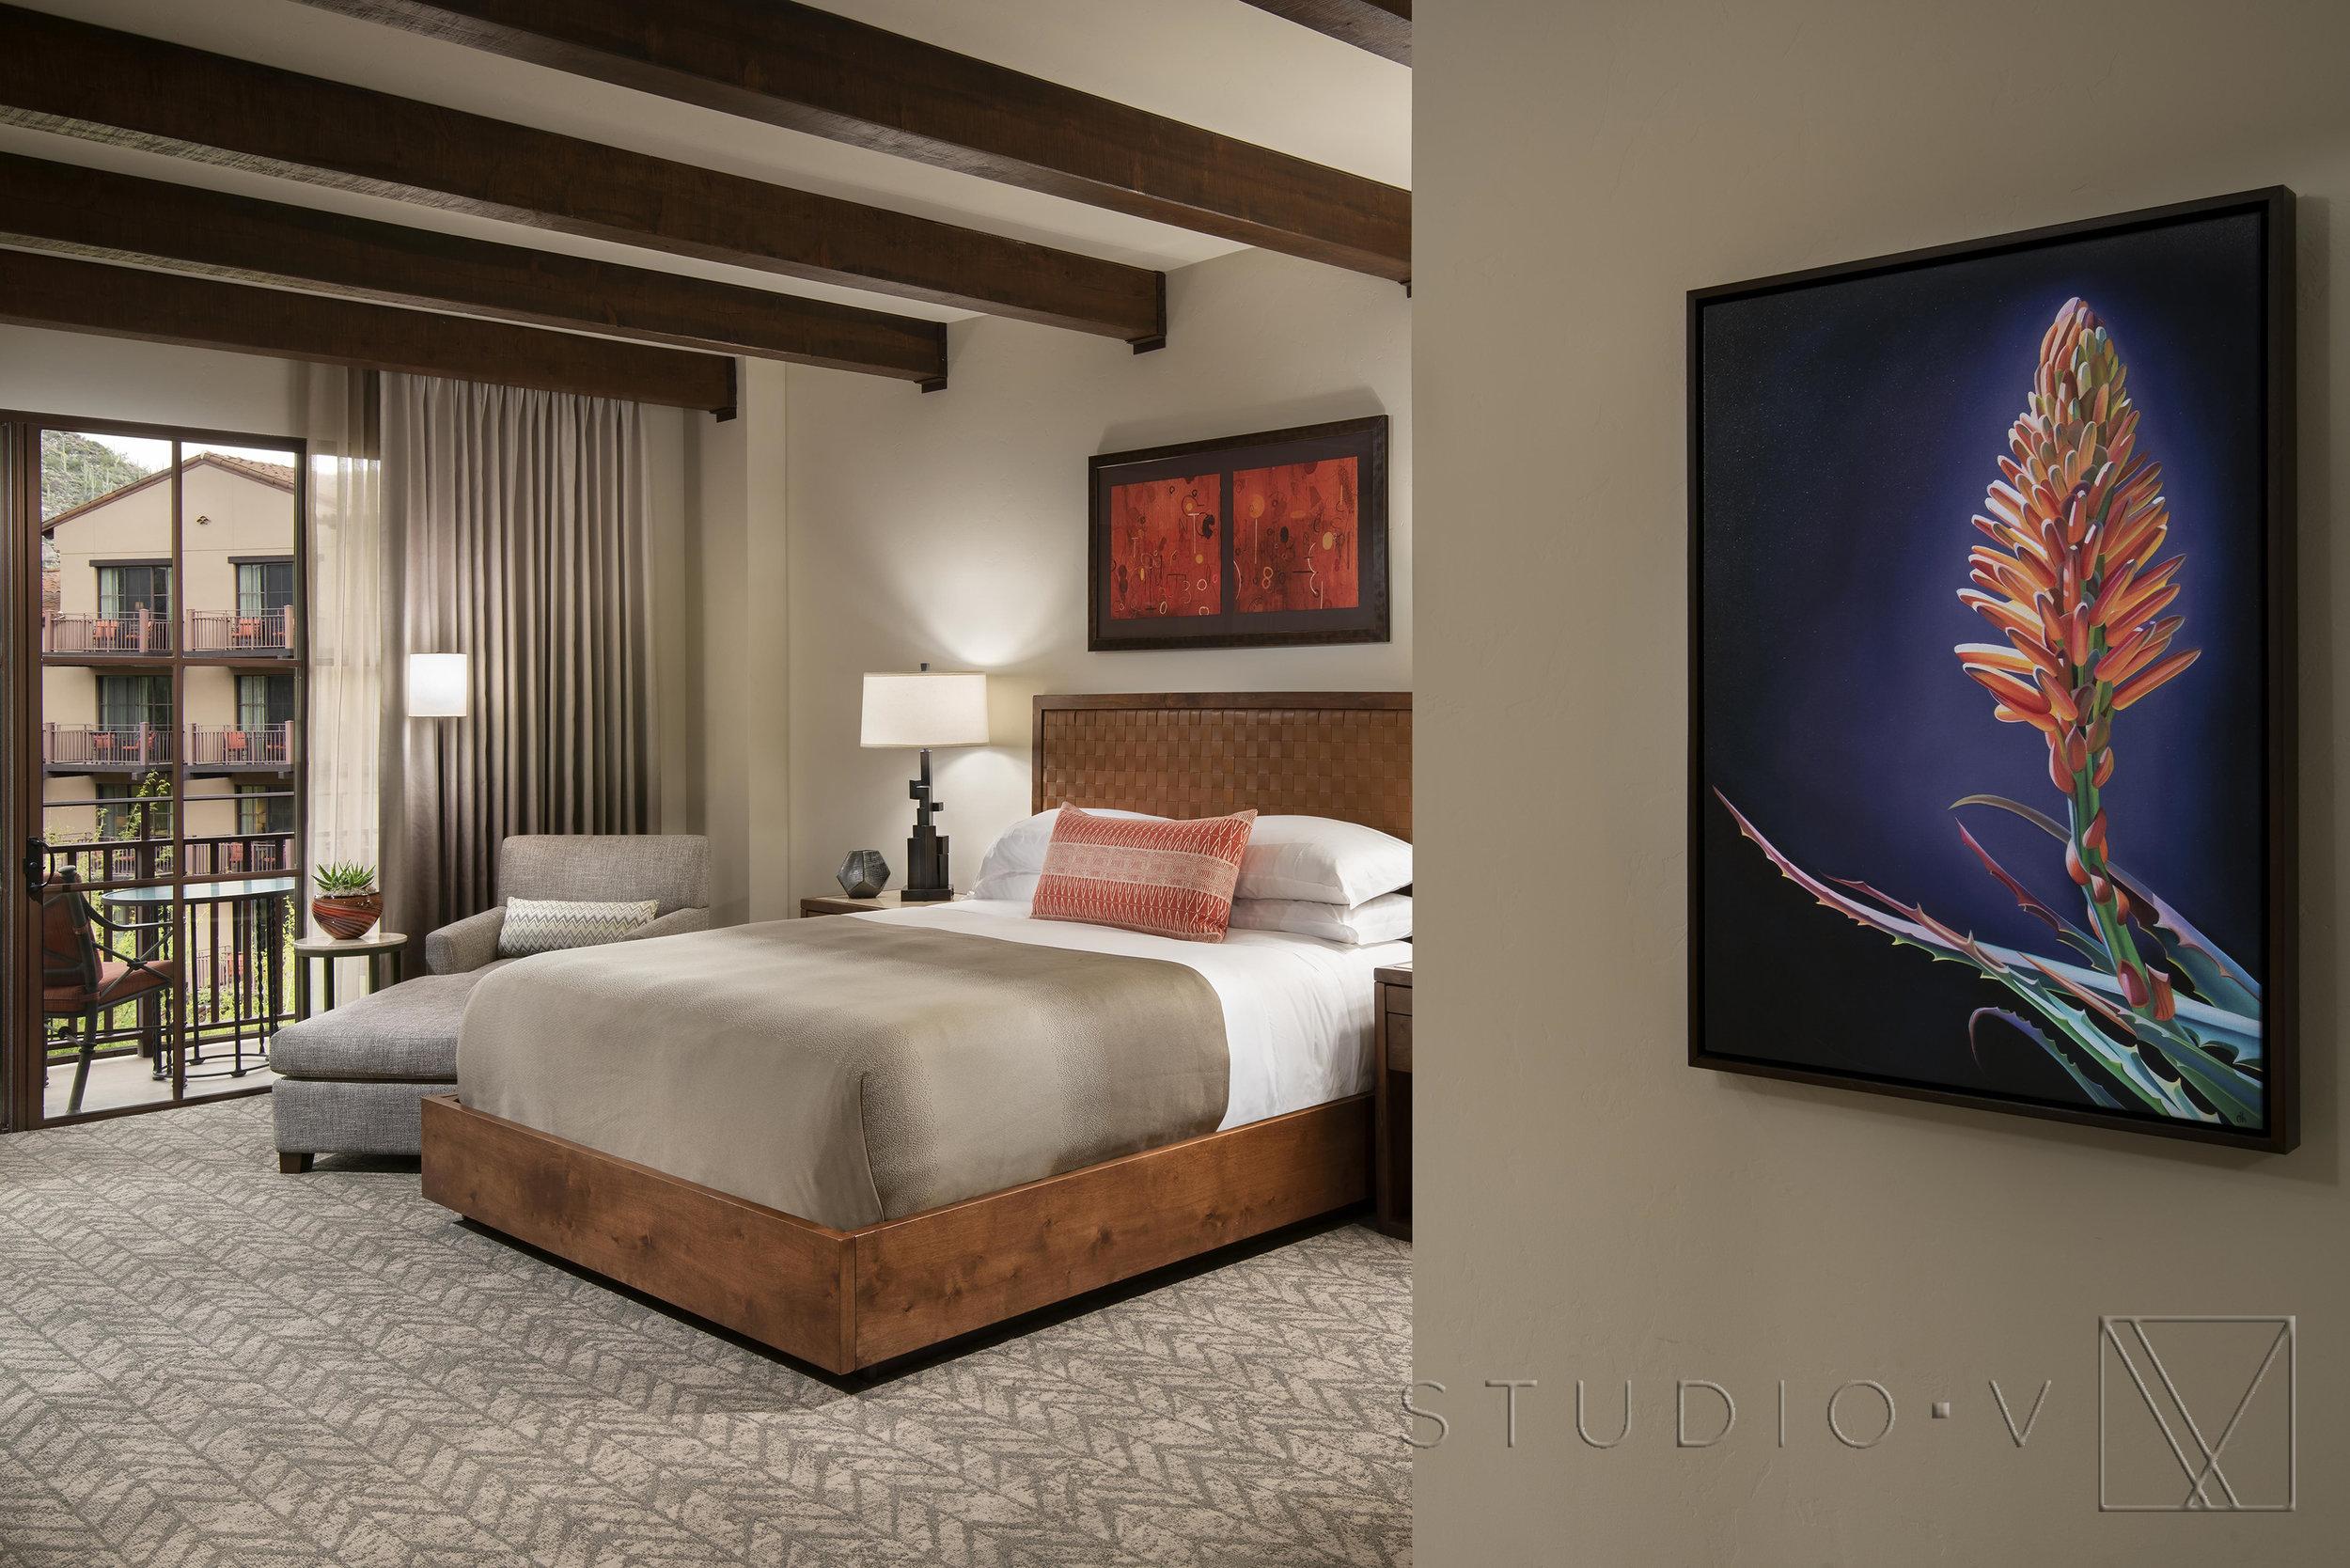 Dino Tonn 4601 Canyon Suite Bedroom 10 Jan 19.jpg